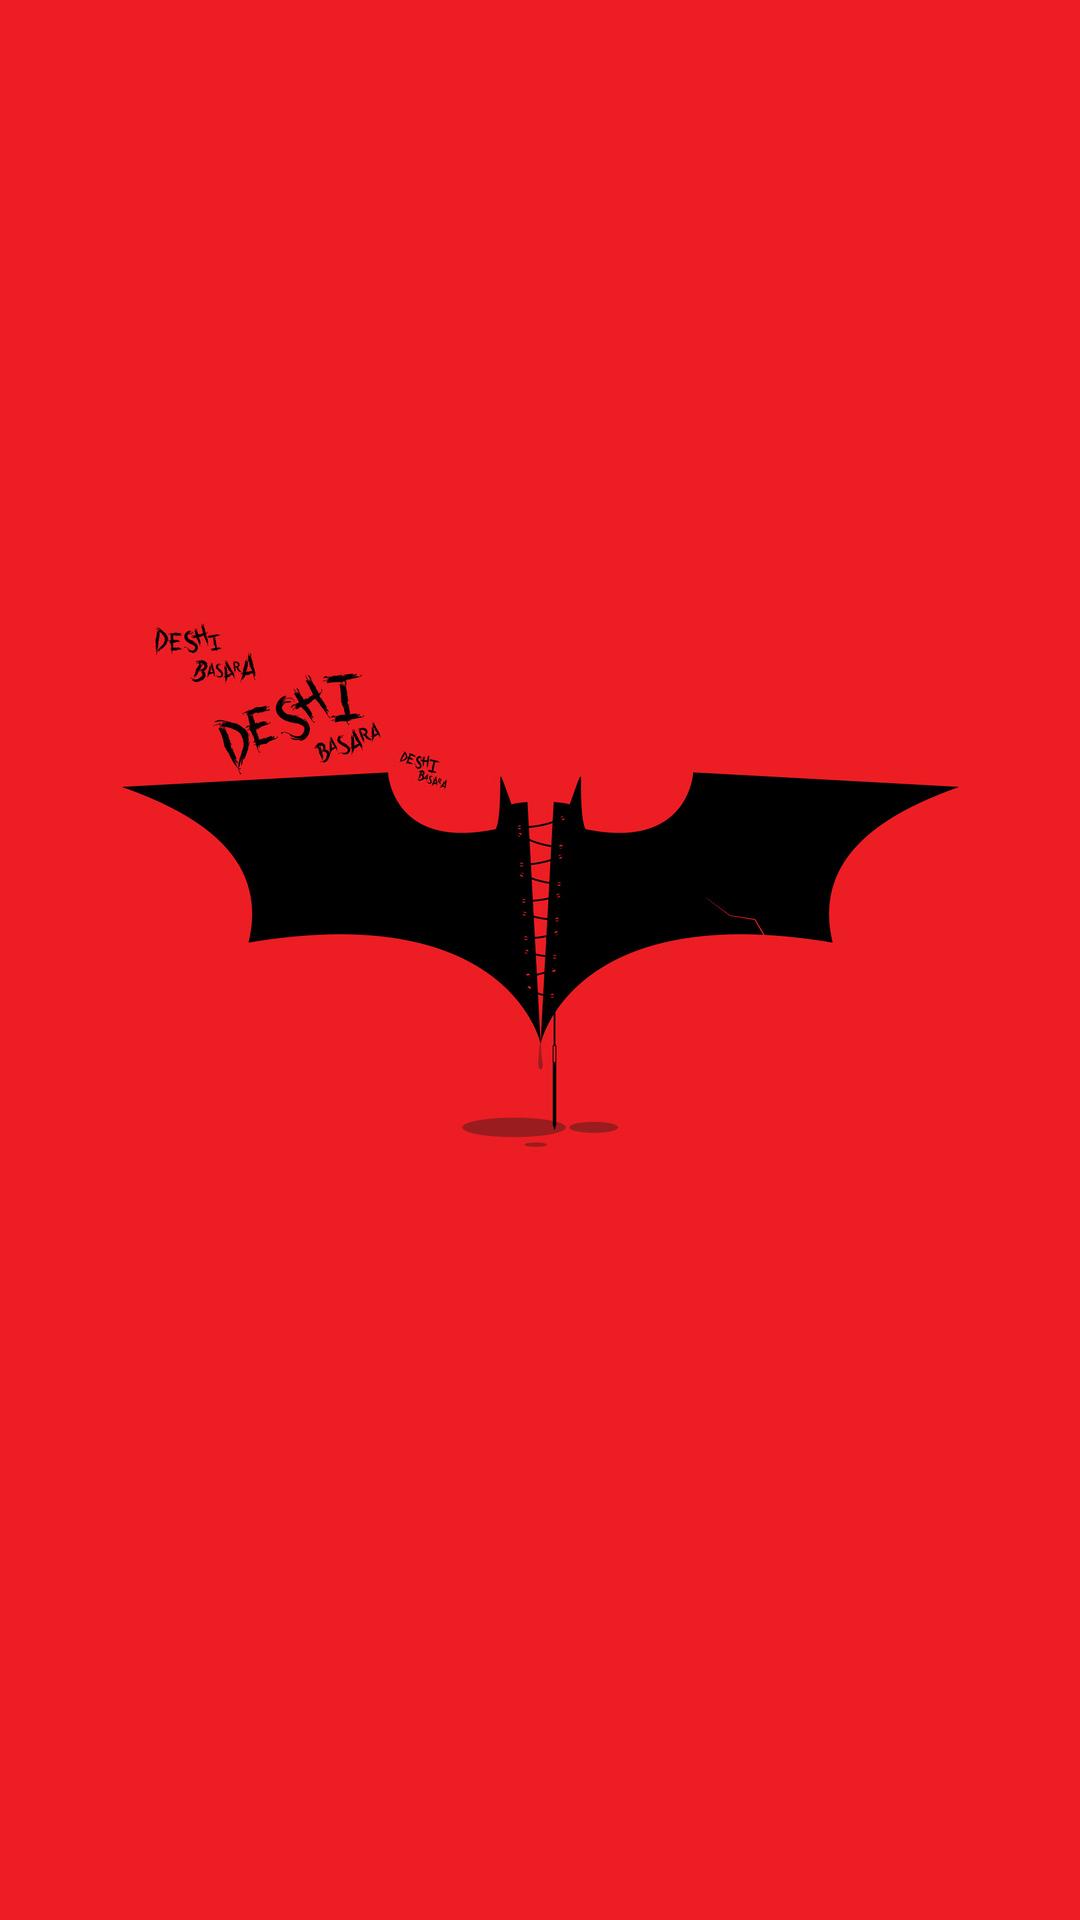 Batman Deshi Basara The Dark Knight Rises iPhone Wallpaper